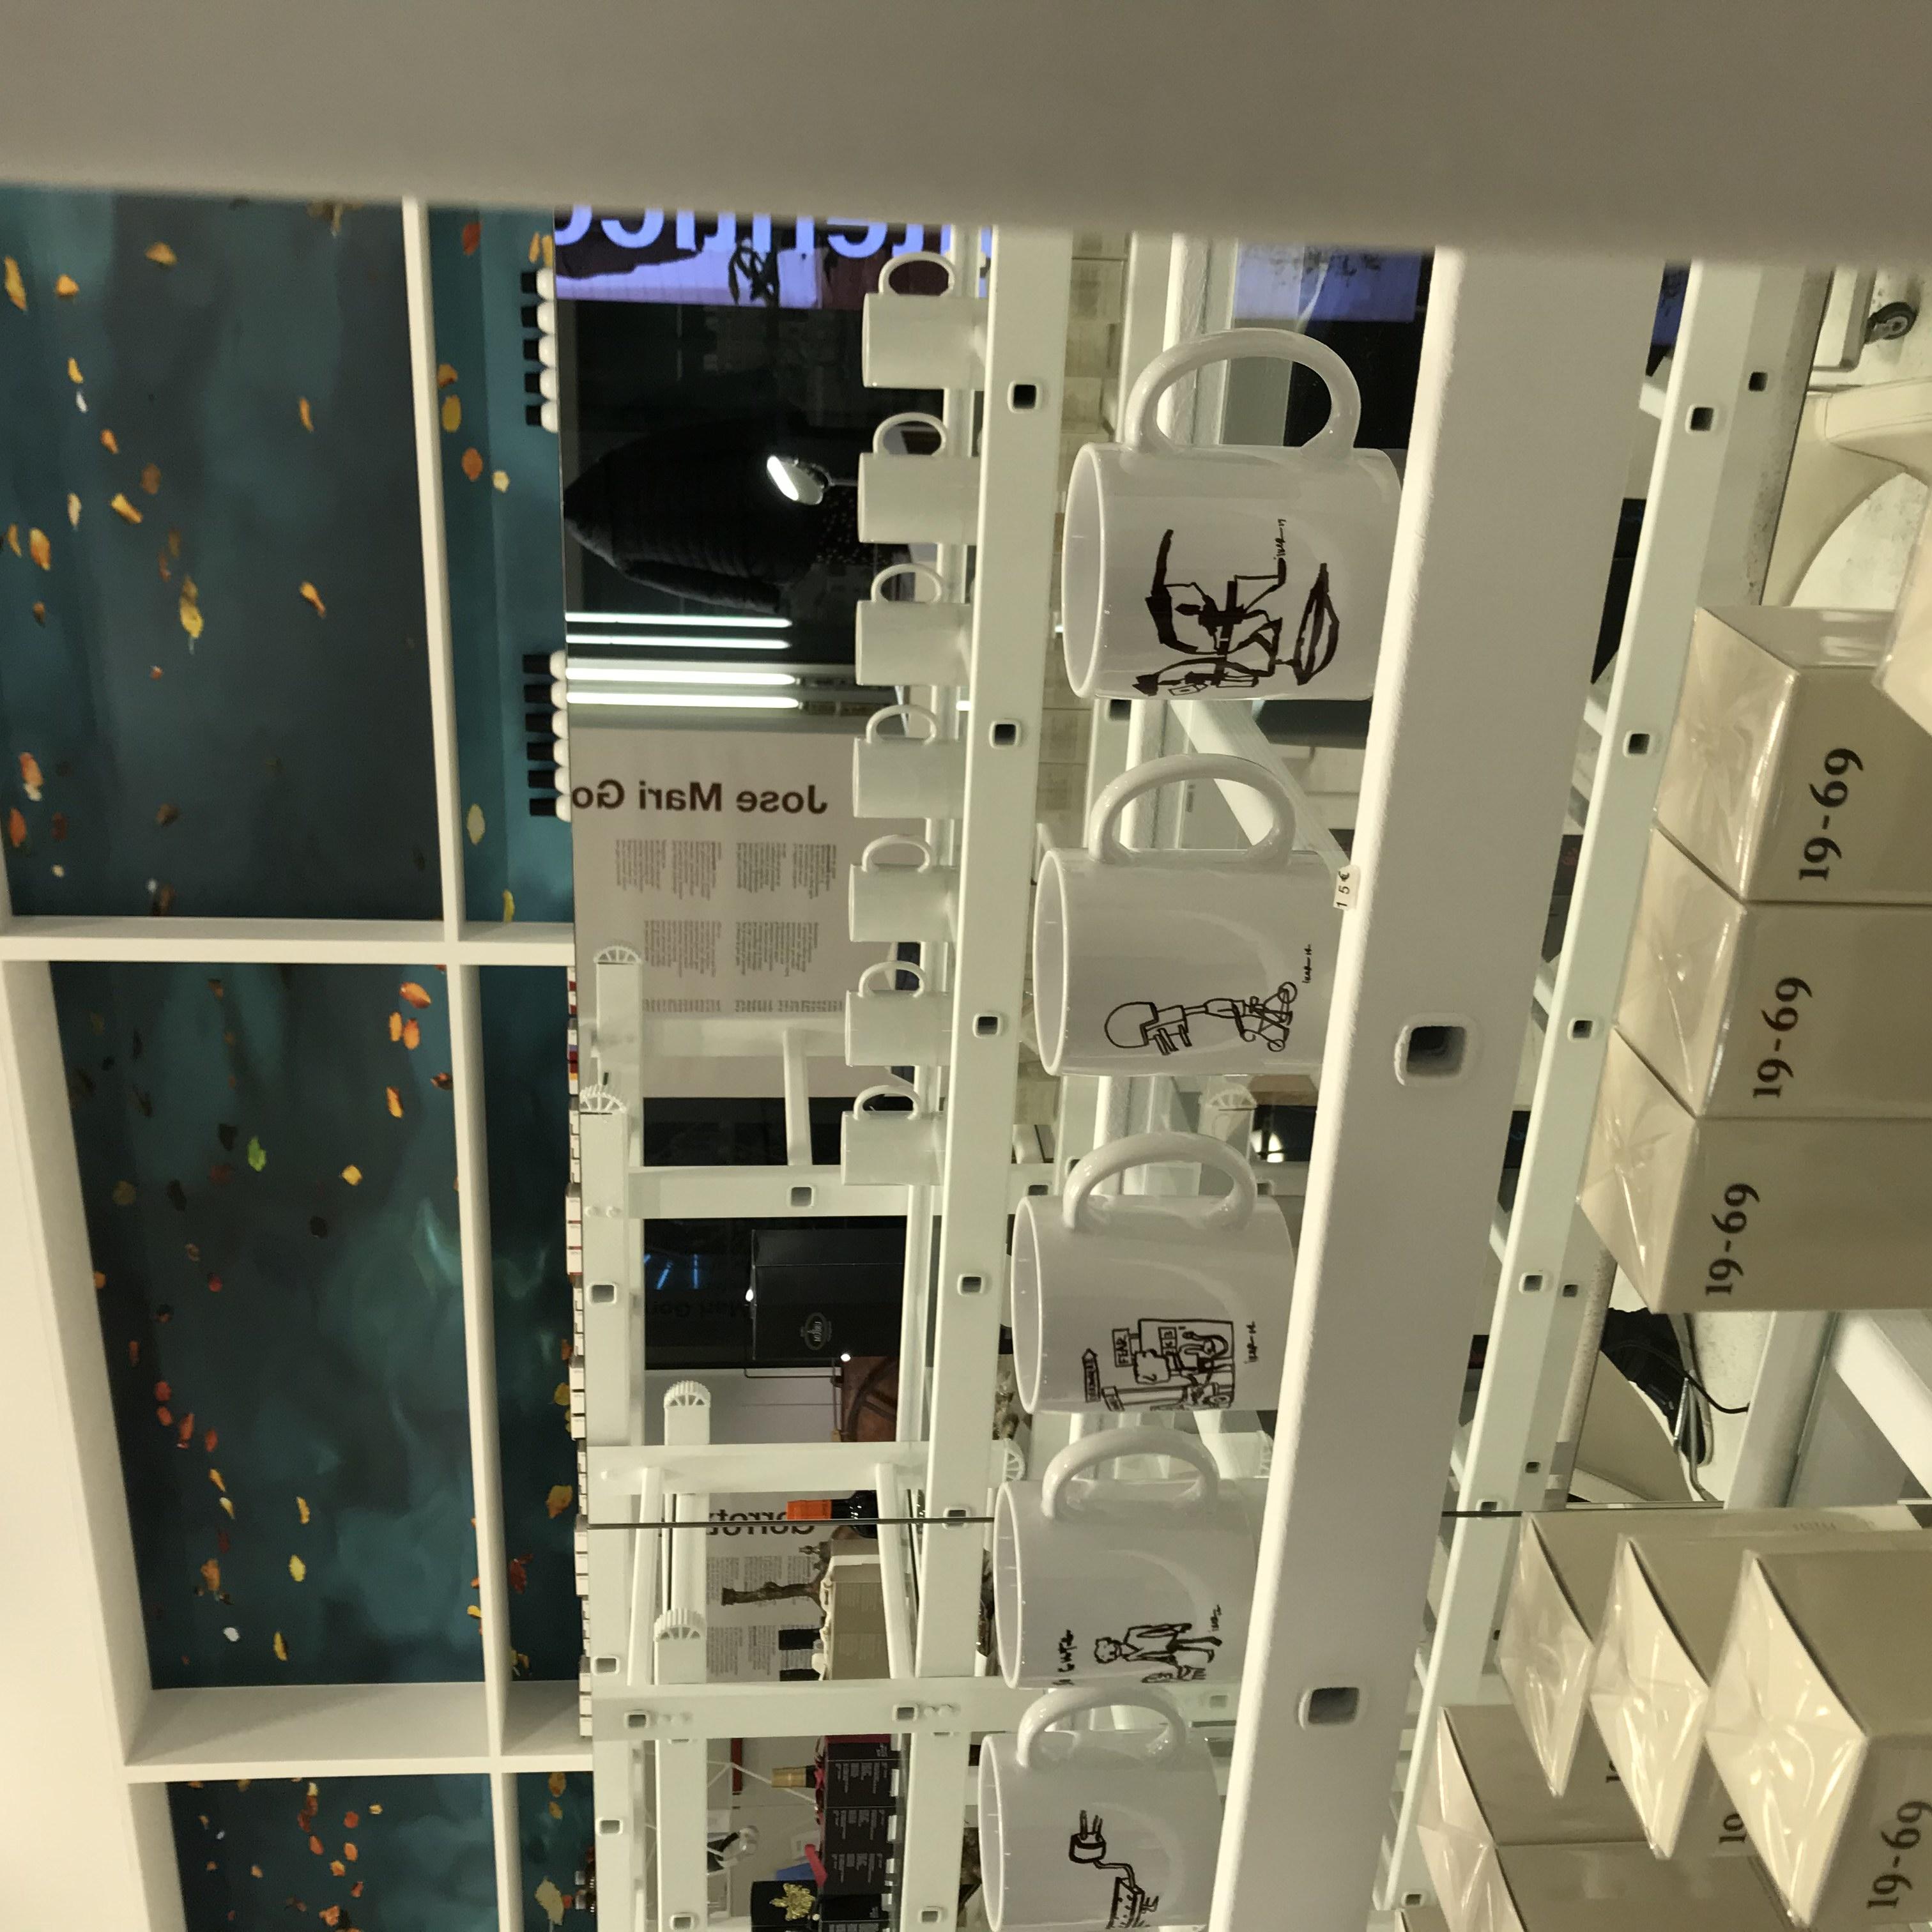 Noventa Grados Concept Store